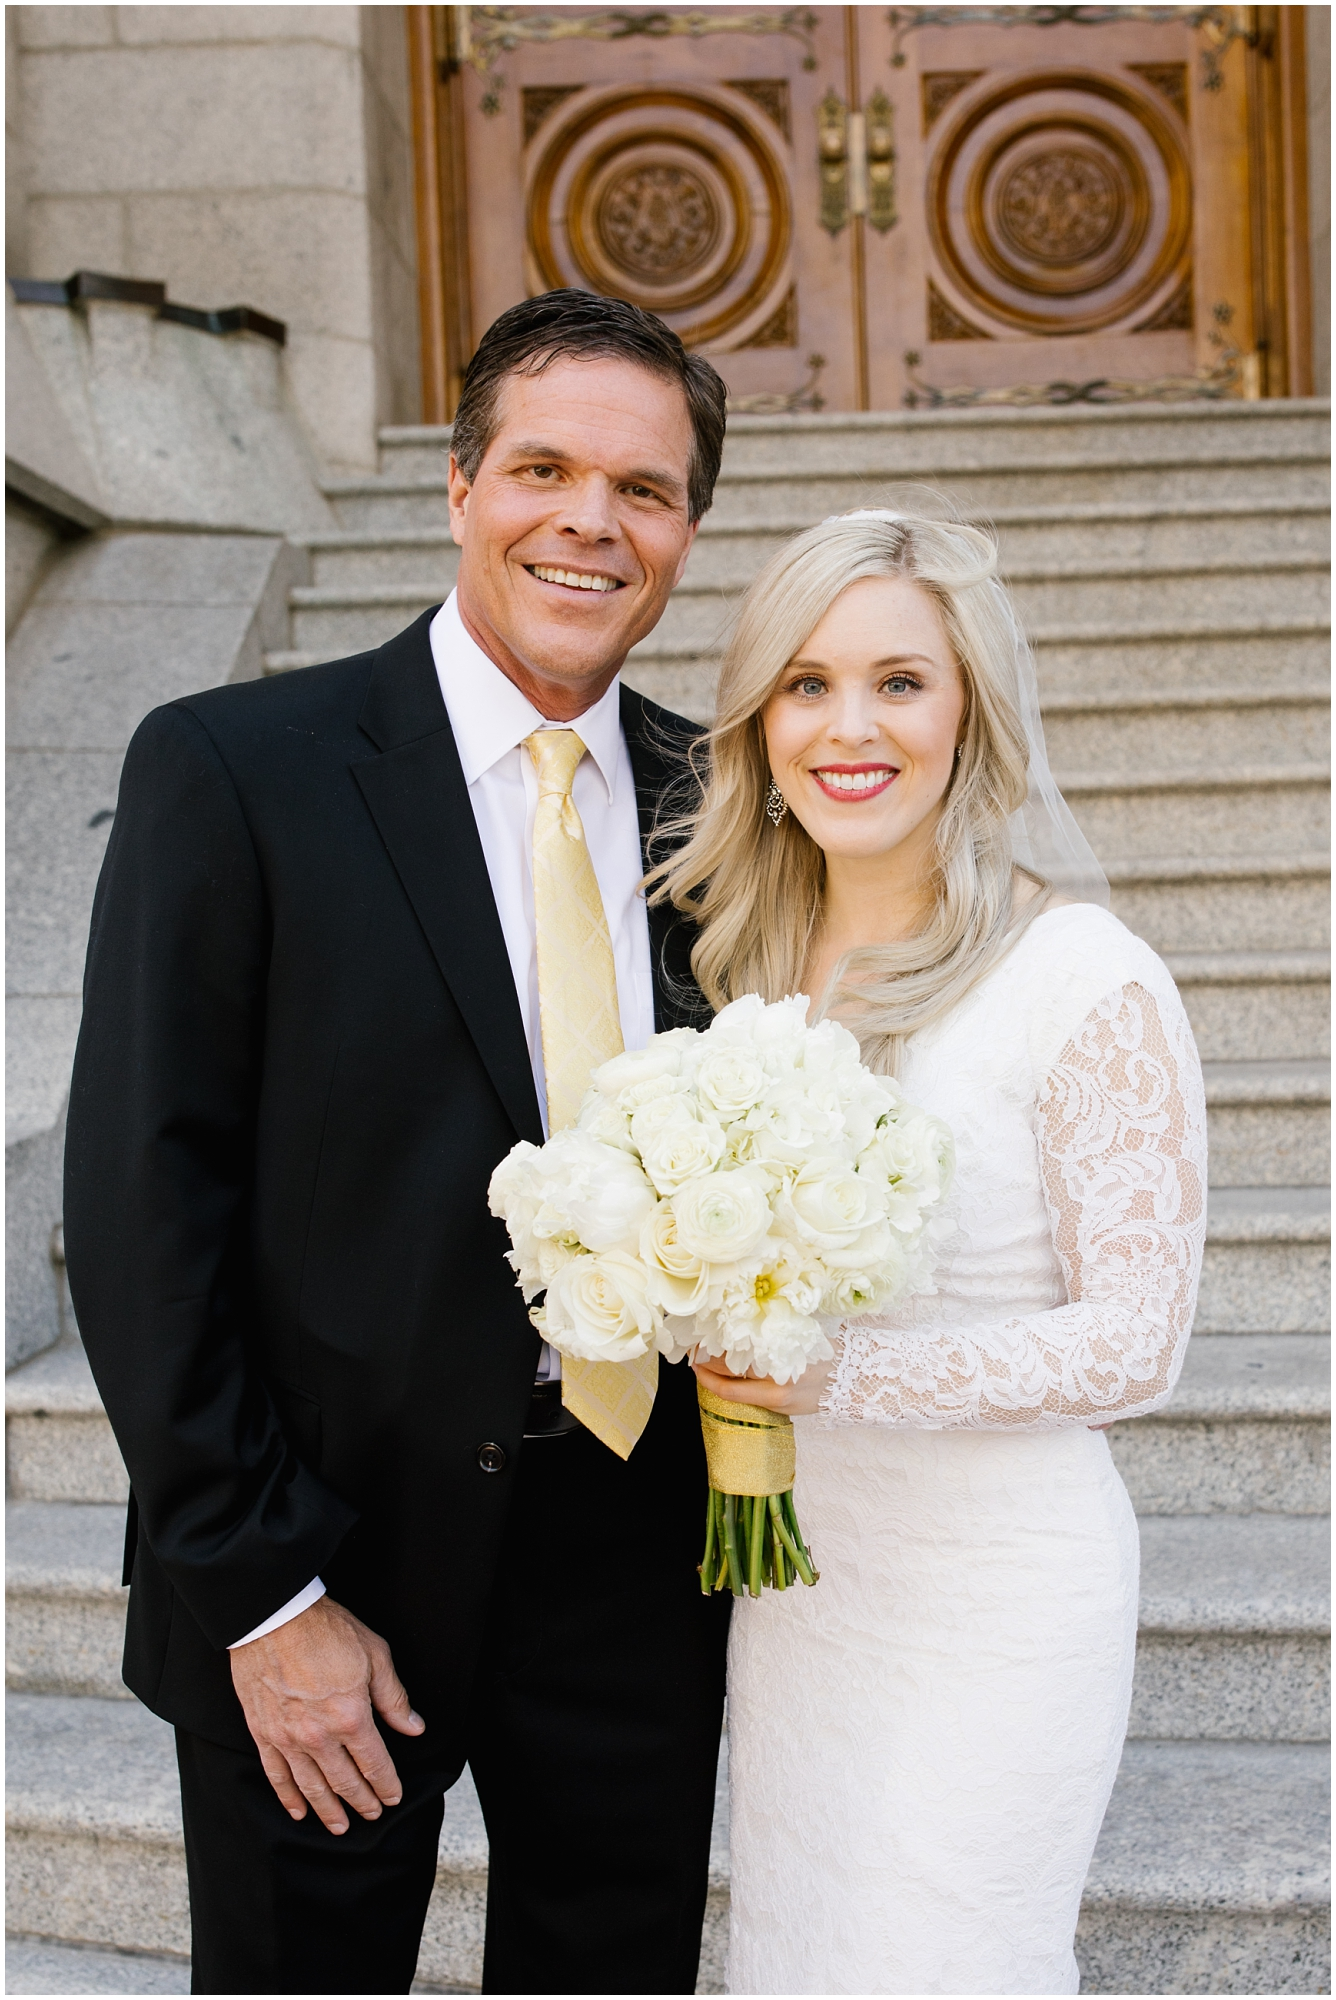 CherylandTyler-92_Lizzie-B-Imagery-Utah-Wedding-Photographer-Park-City-Salt-Lake-City-Temple-Wells-Fargo-Building.jpg